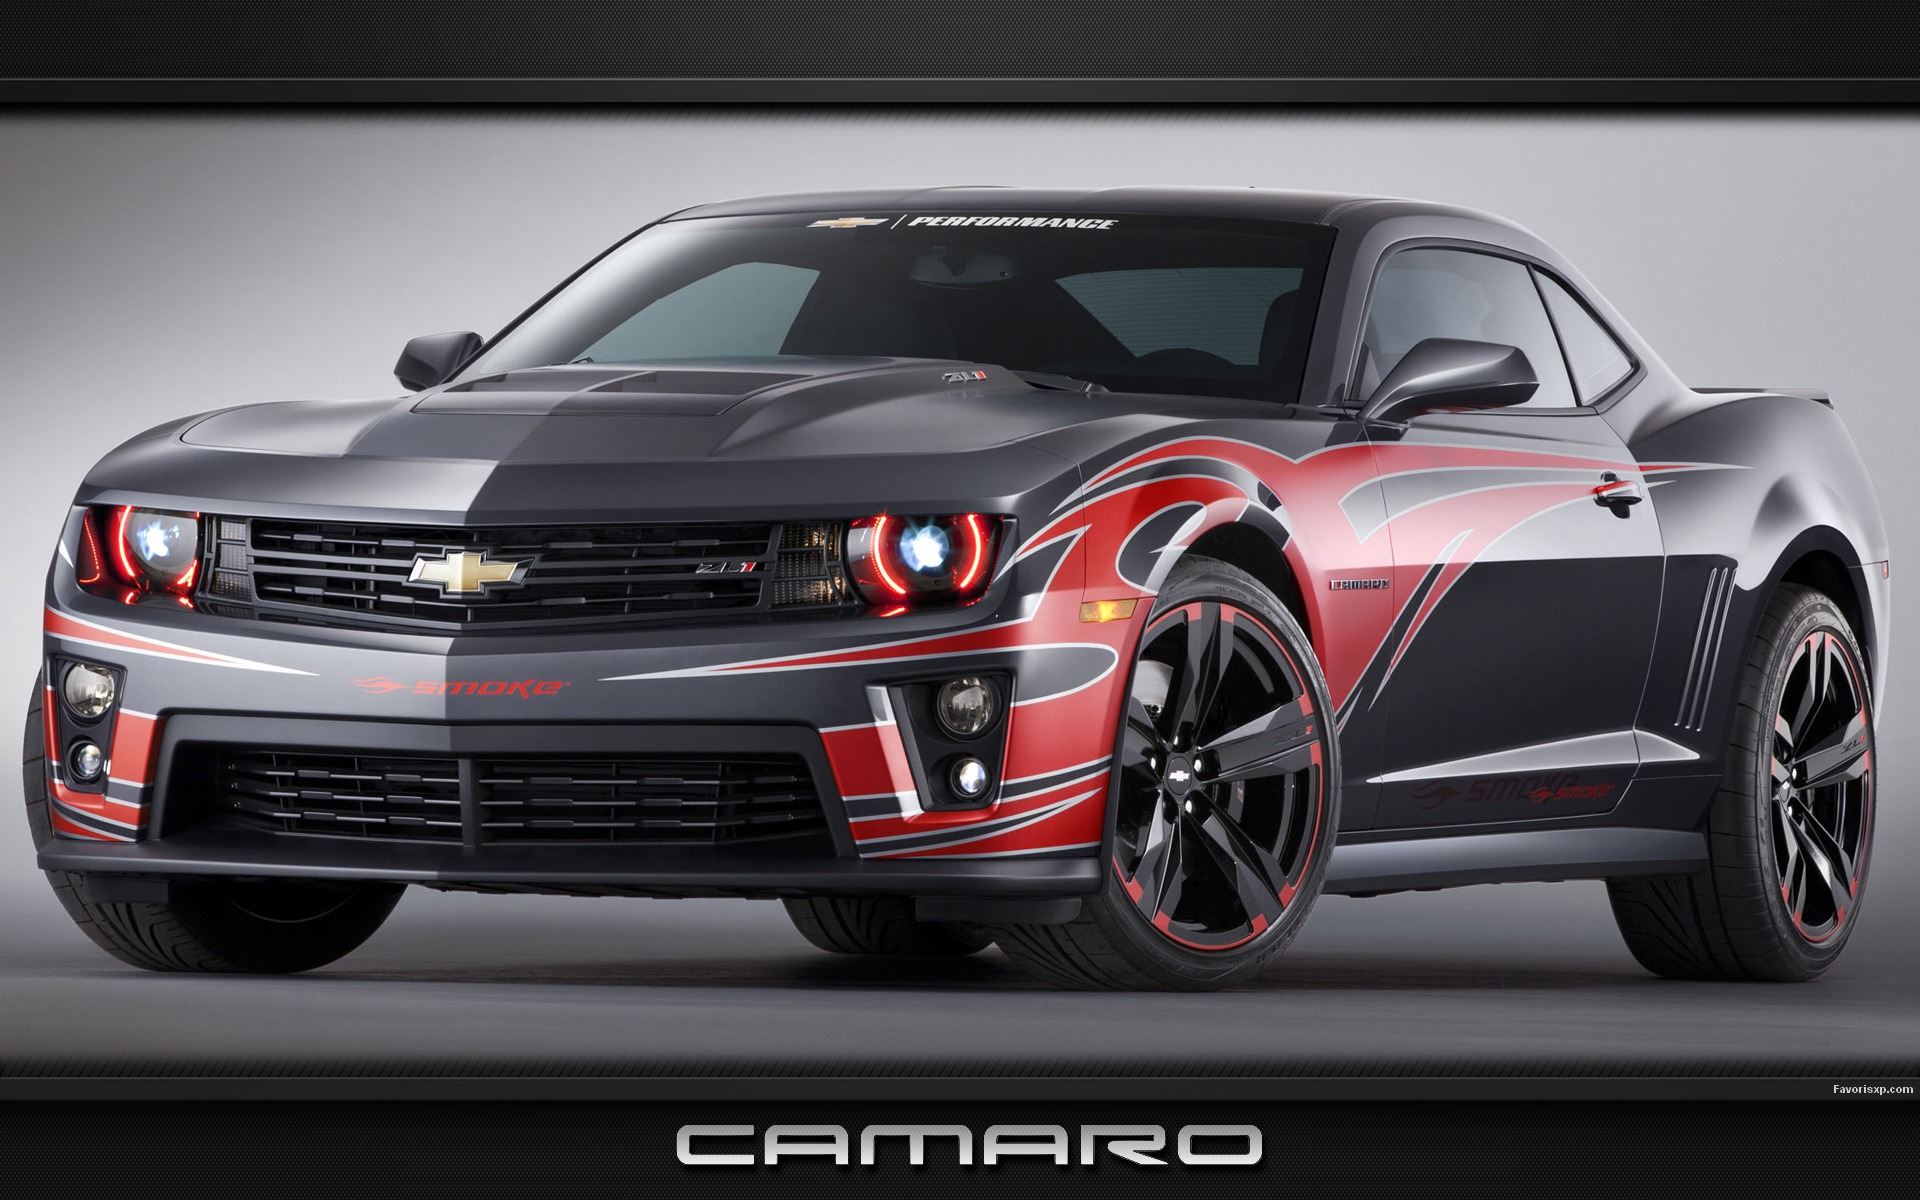 Fond D 201 Cran Chevrolet Camaro Id 233 E D Image De Voiture